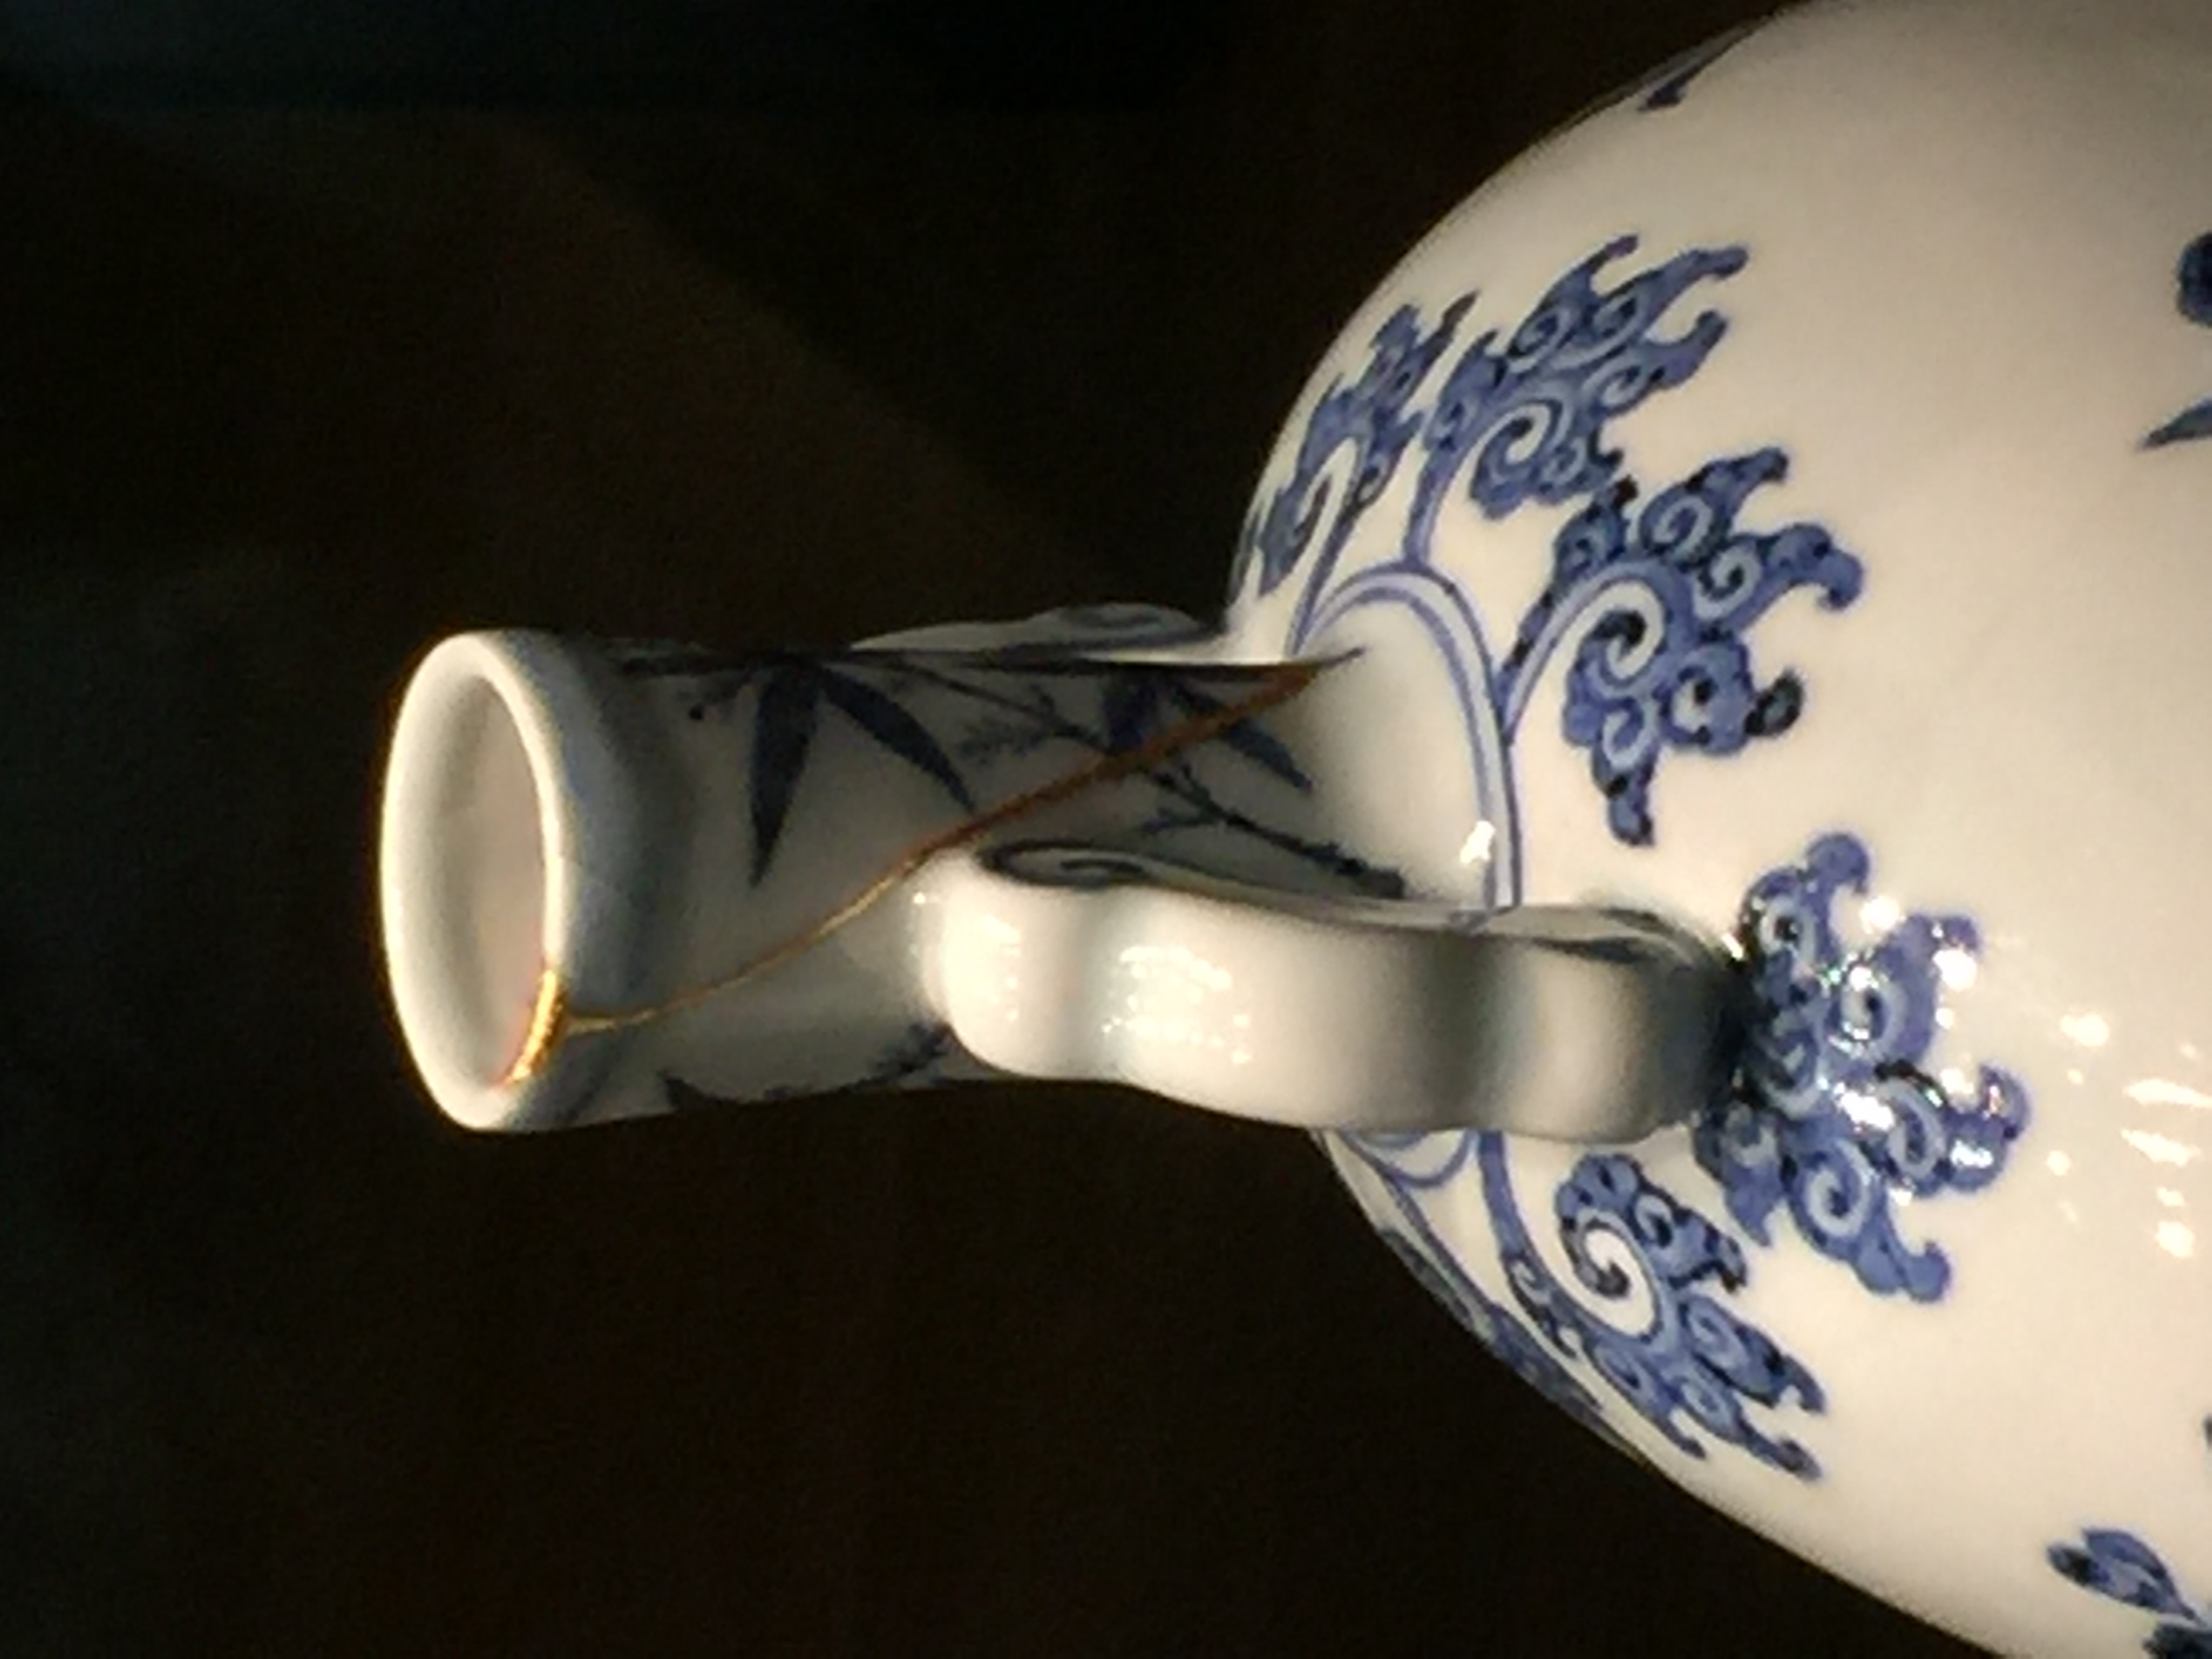 Chinese-Porcelain-British-Museum-Percival-David-jessewaugh.com-53.jpg